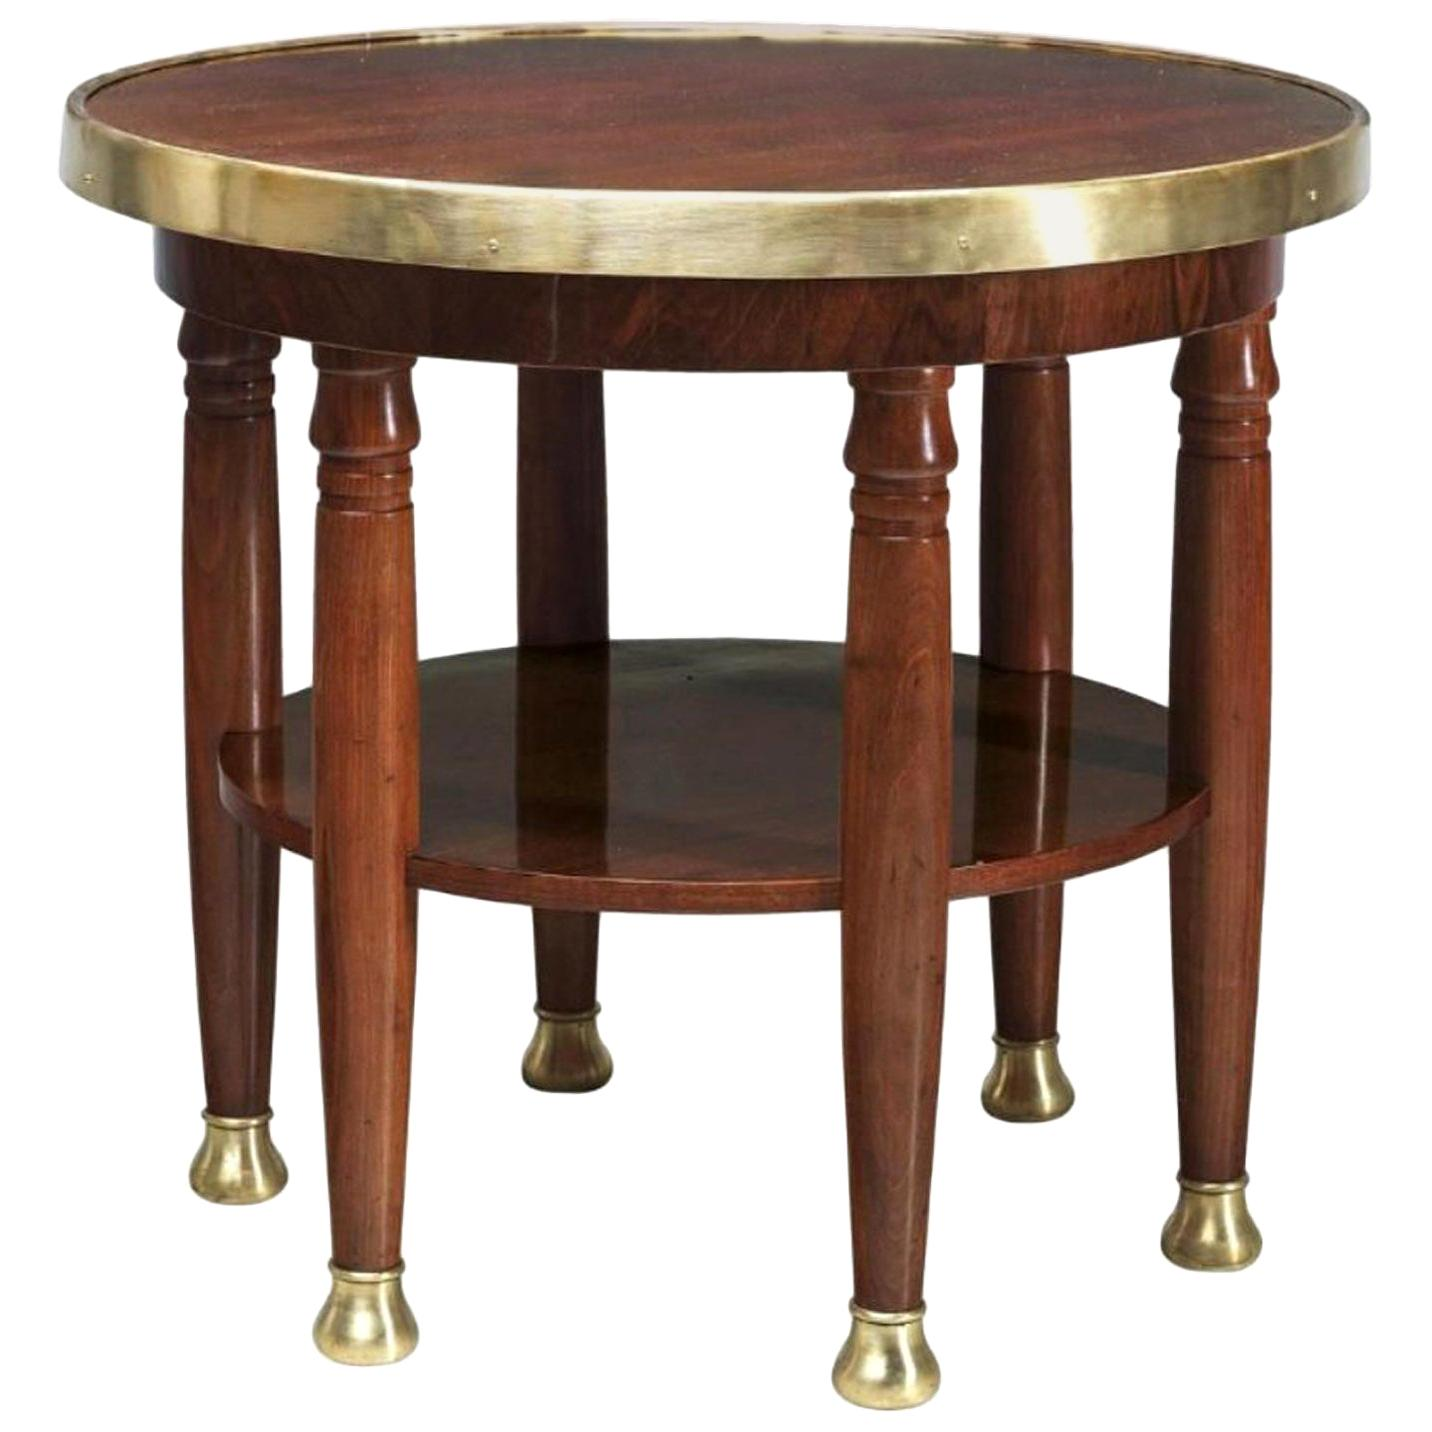 Original Adolf Loos Haberfeld Table Variation, Art Deco, Jugendstil, Secession